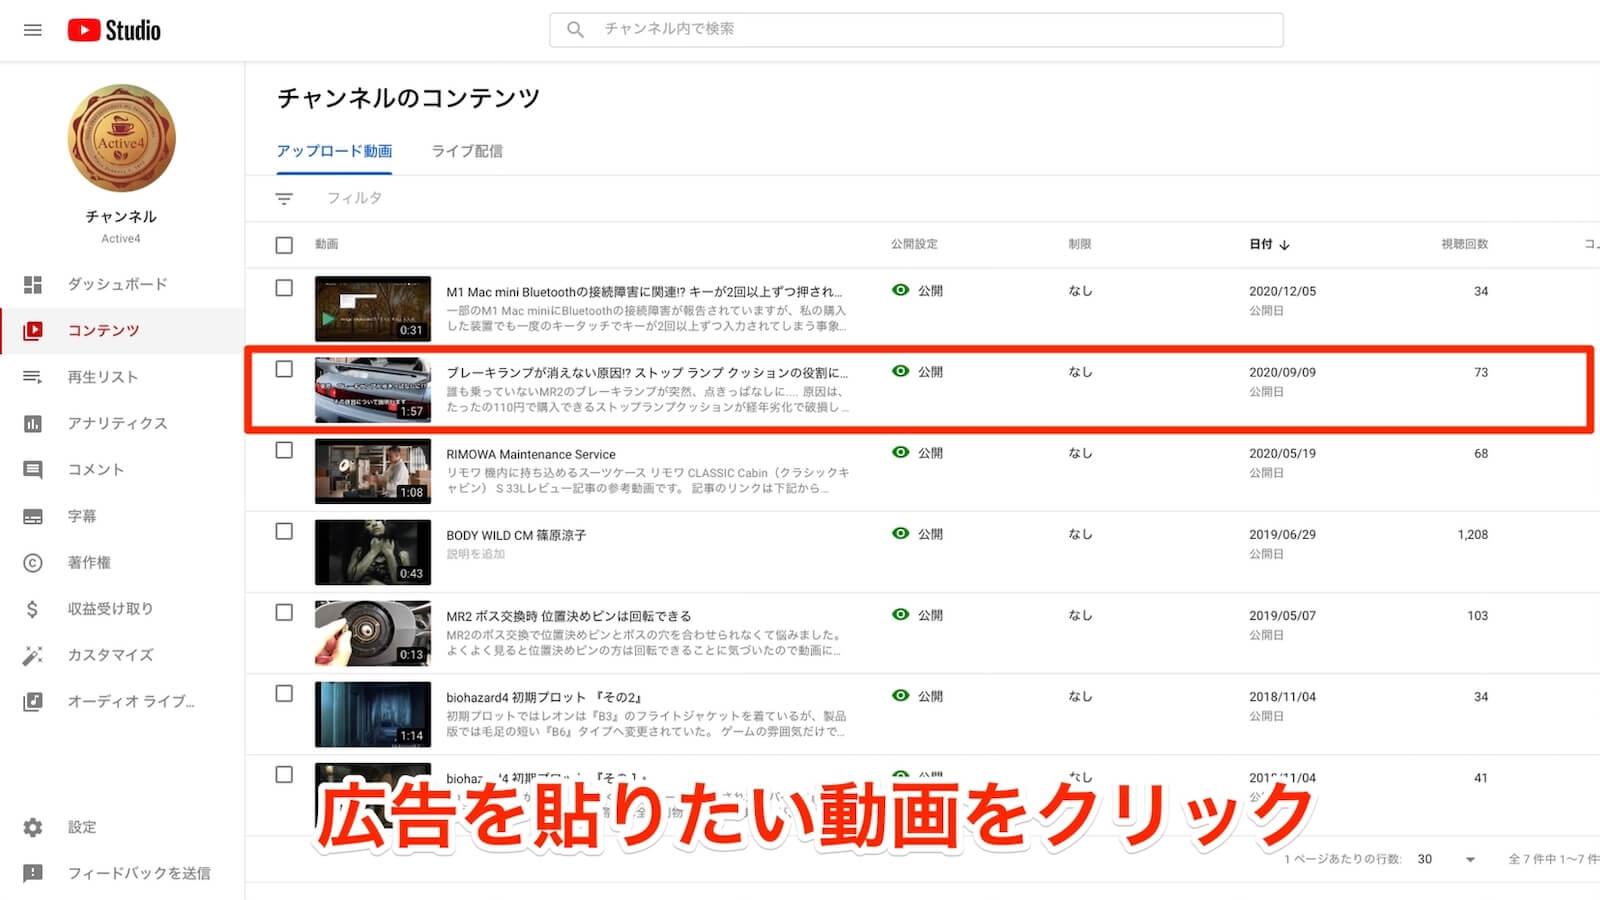 YouTube Studio channel content screen capture